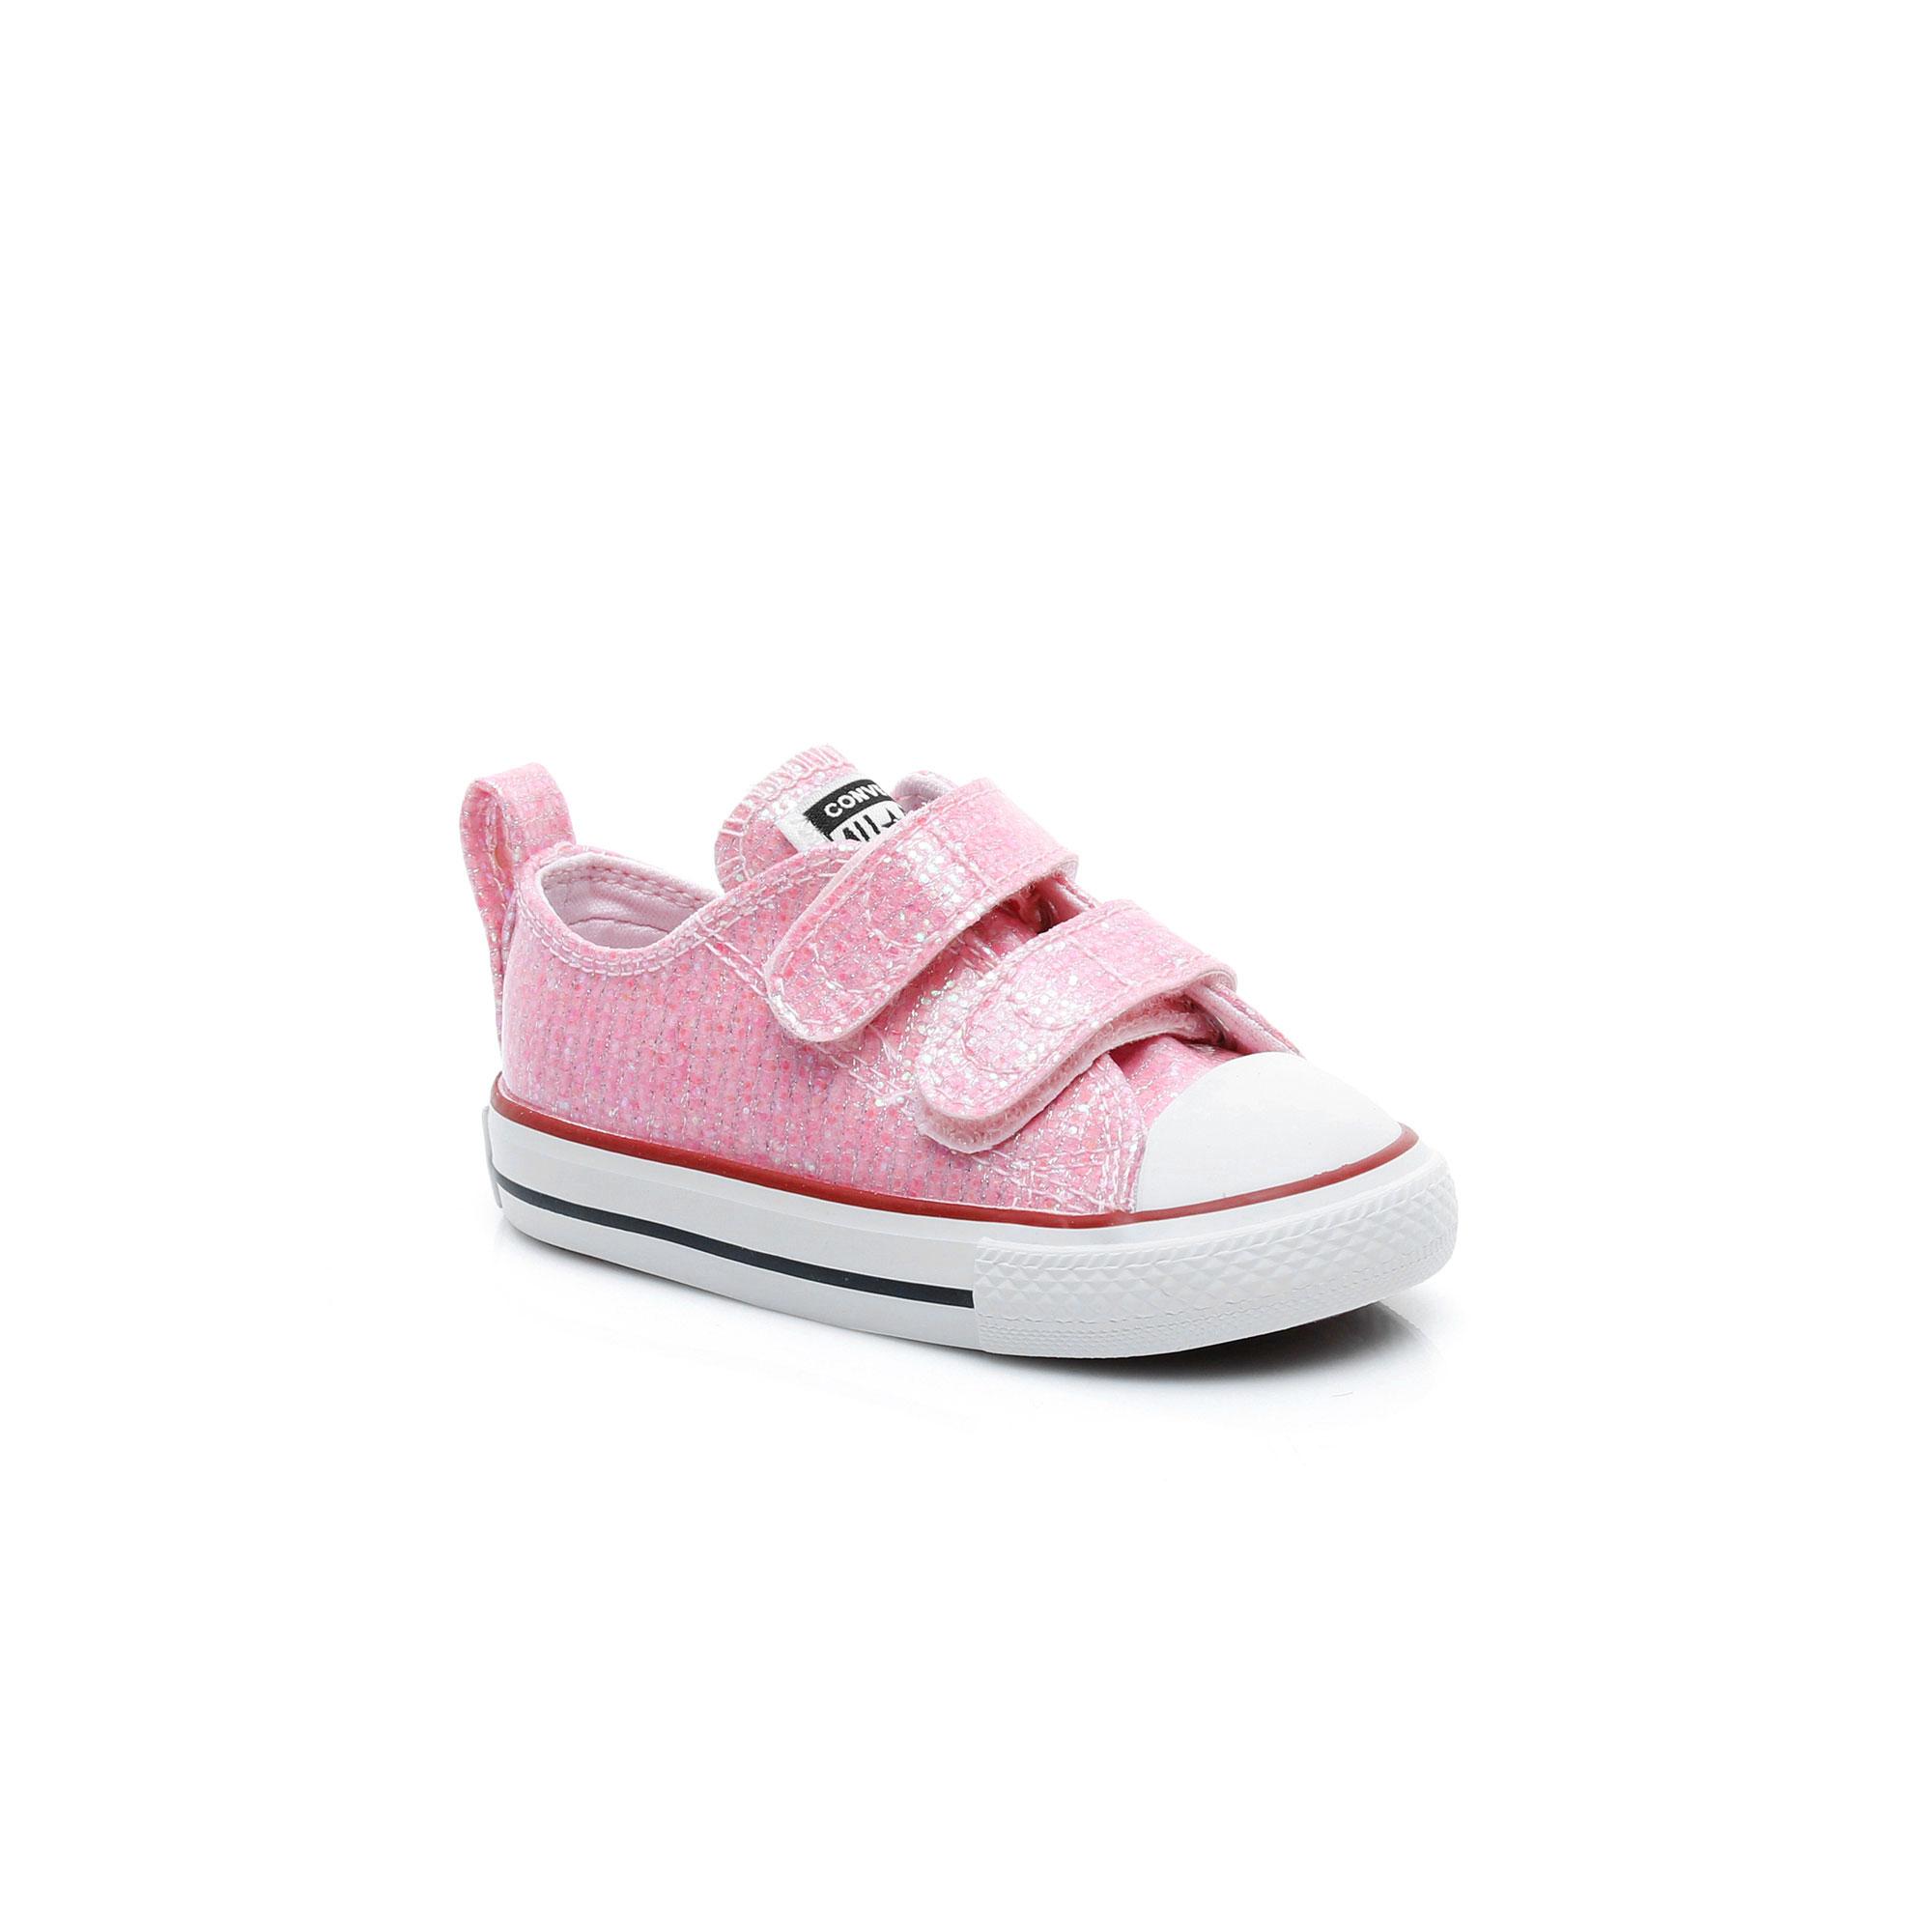 Converse Chuck Taylor All Star 2V Sparkle Çocuk Pembe Sneaker